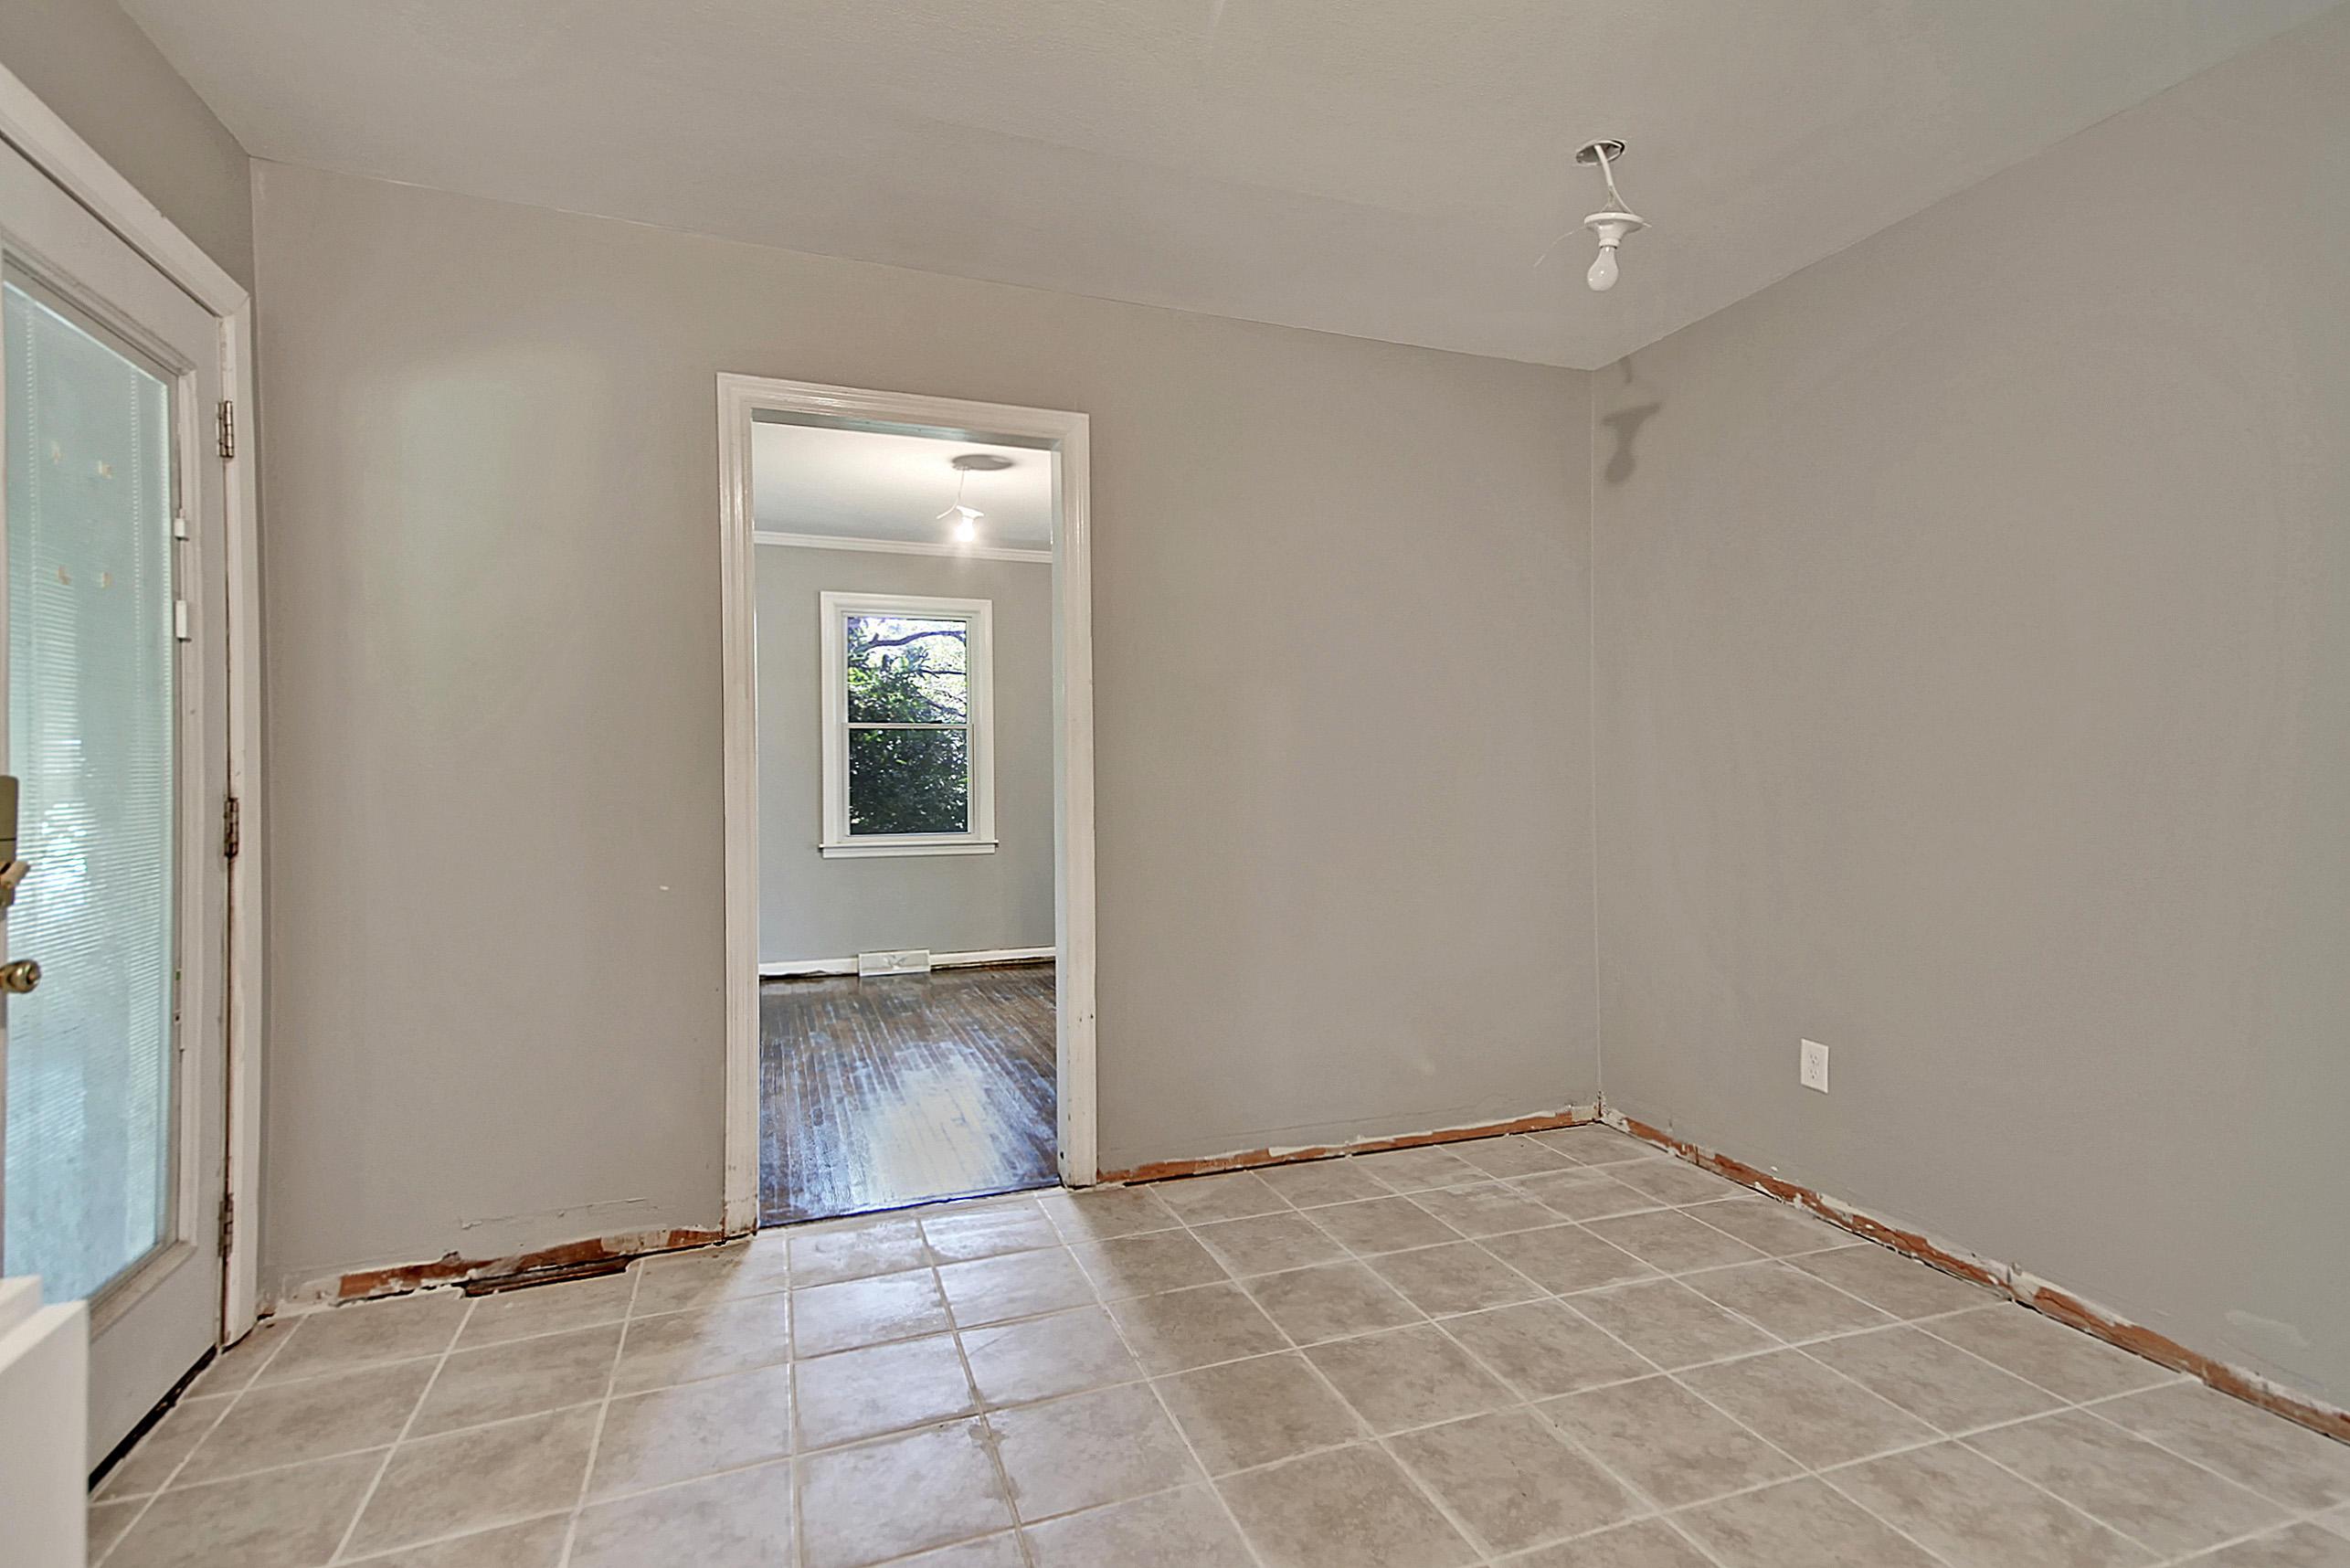 Northbridge Terrace Homes For Sale - 1094 Northbridge, Charleston, SC - 10